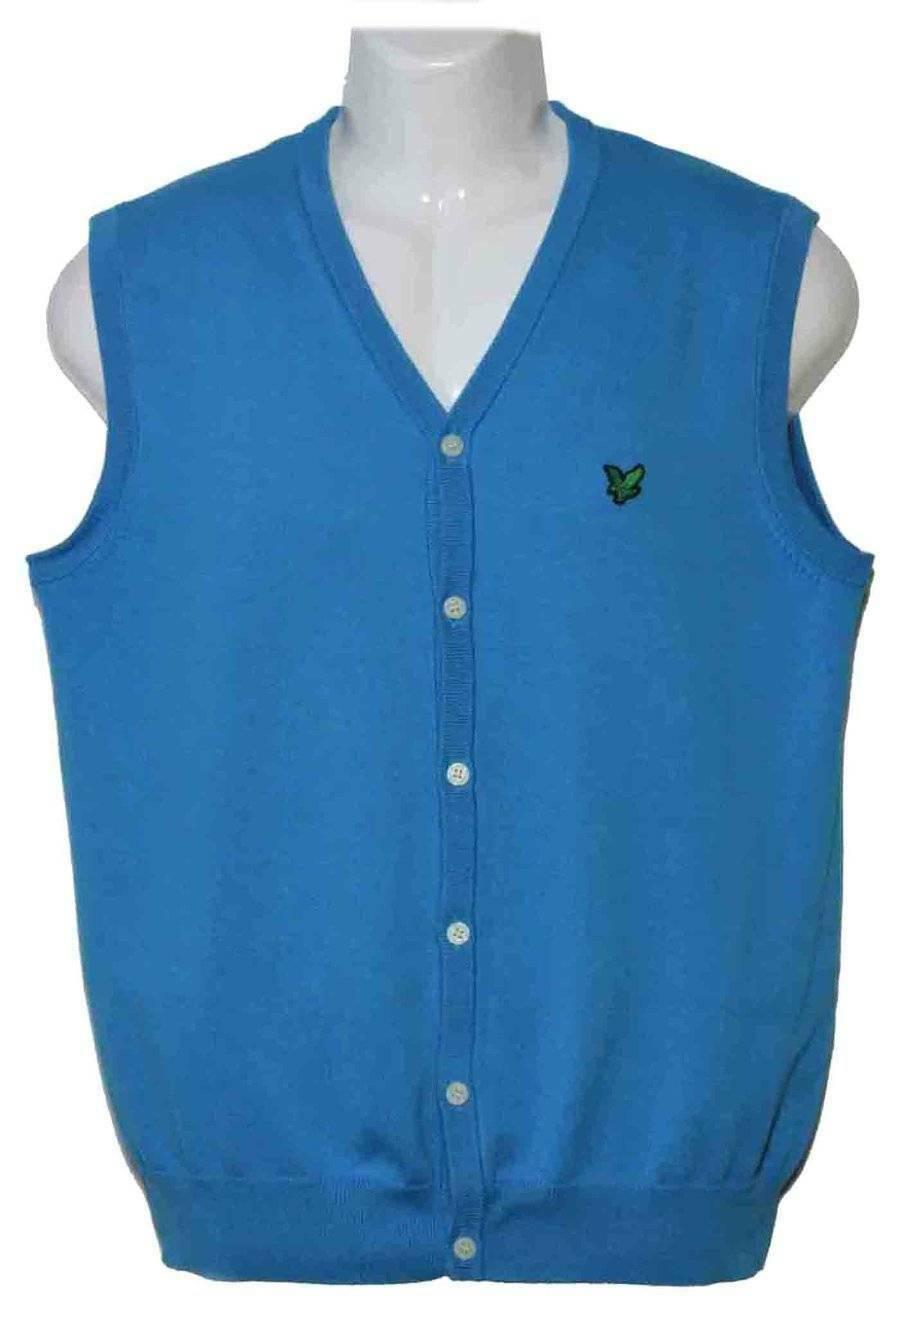 Lyle & Scott of Scotland Cotton Sweater Vest Blue Turquoise Men's Size Slim Medium